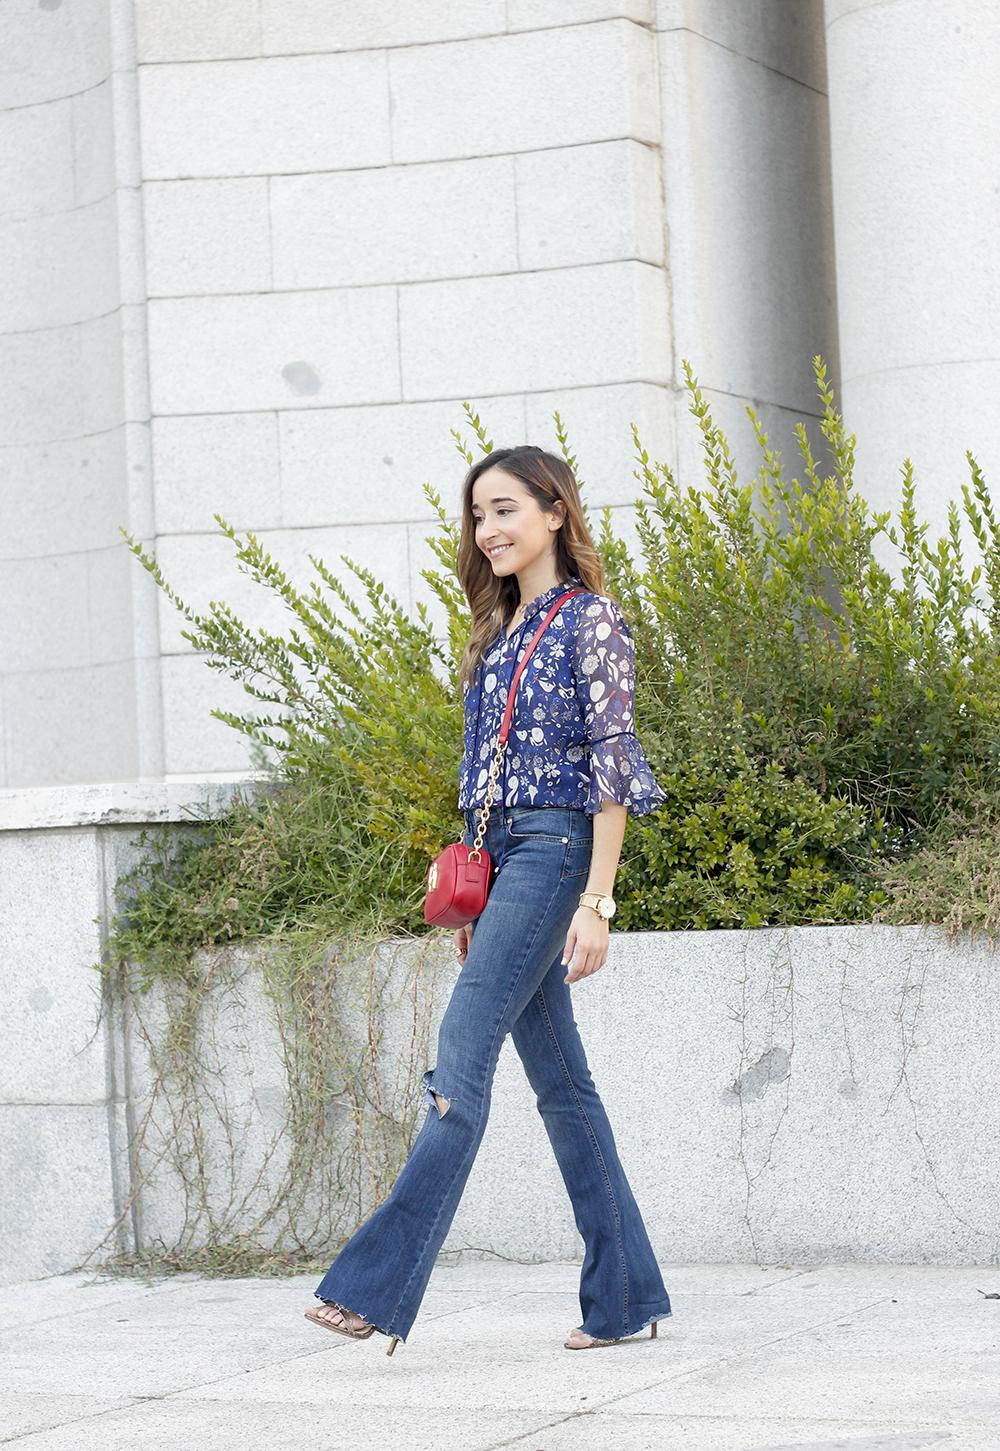 flared jeans liu jo blue blouse uterqüe boho outfit fashion style10